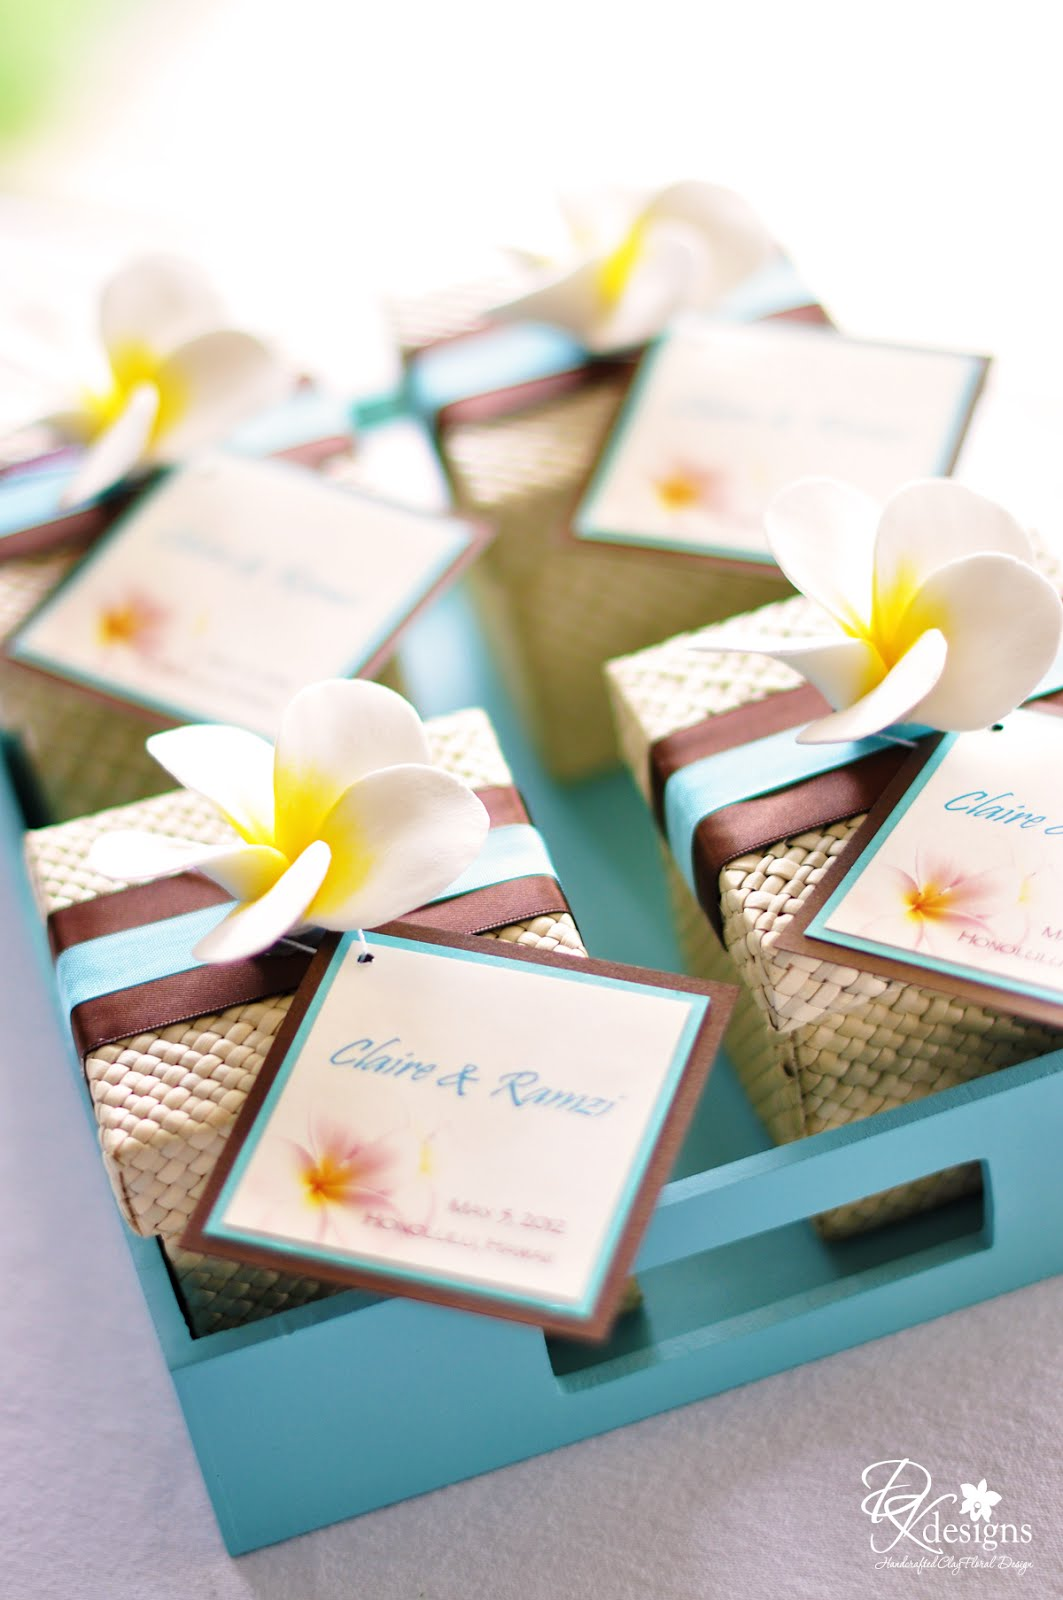 Hawaiian Wedding Favor Boxes : DK Designs: Destination Hawaii Wedding Favors